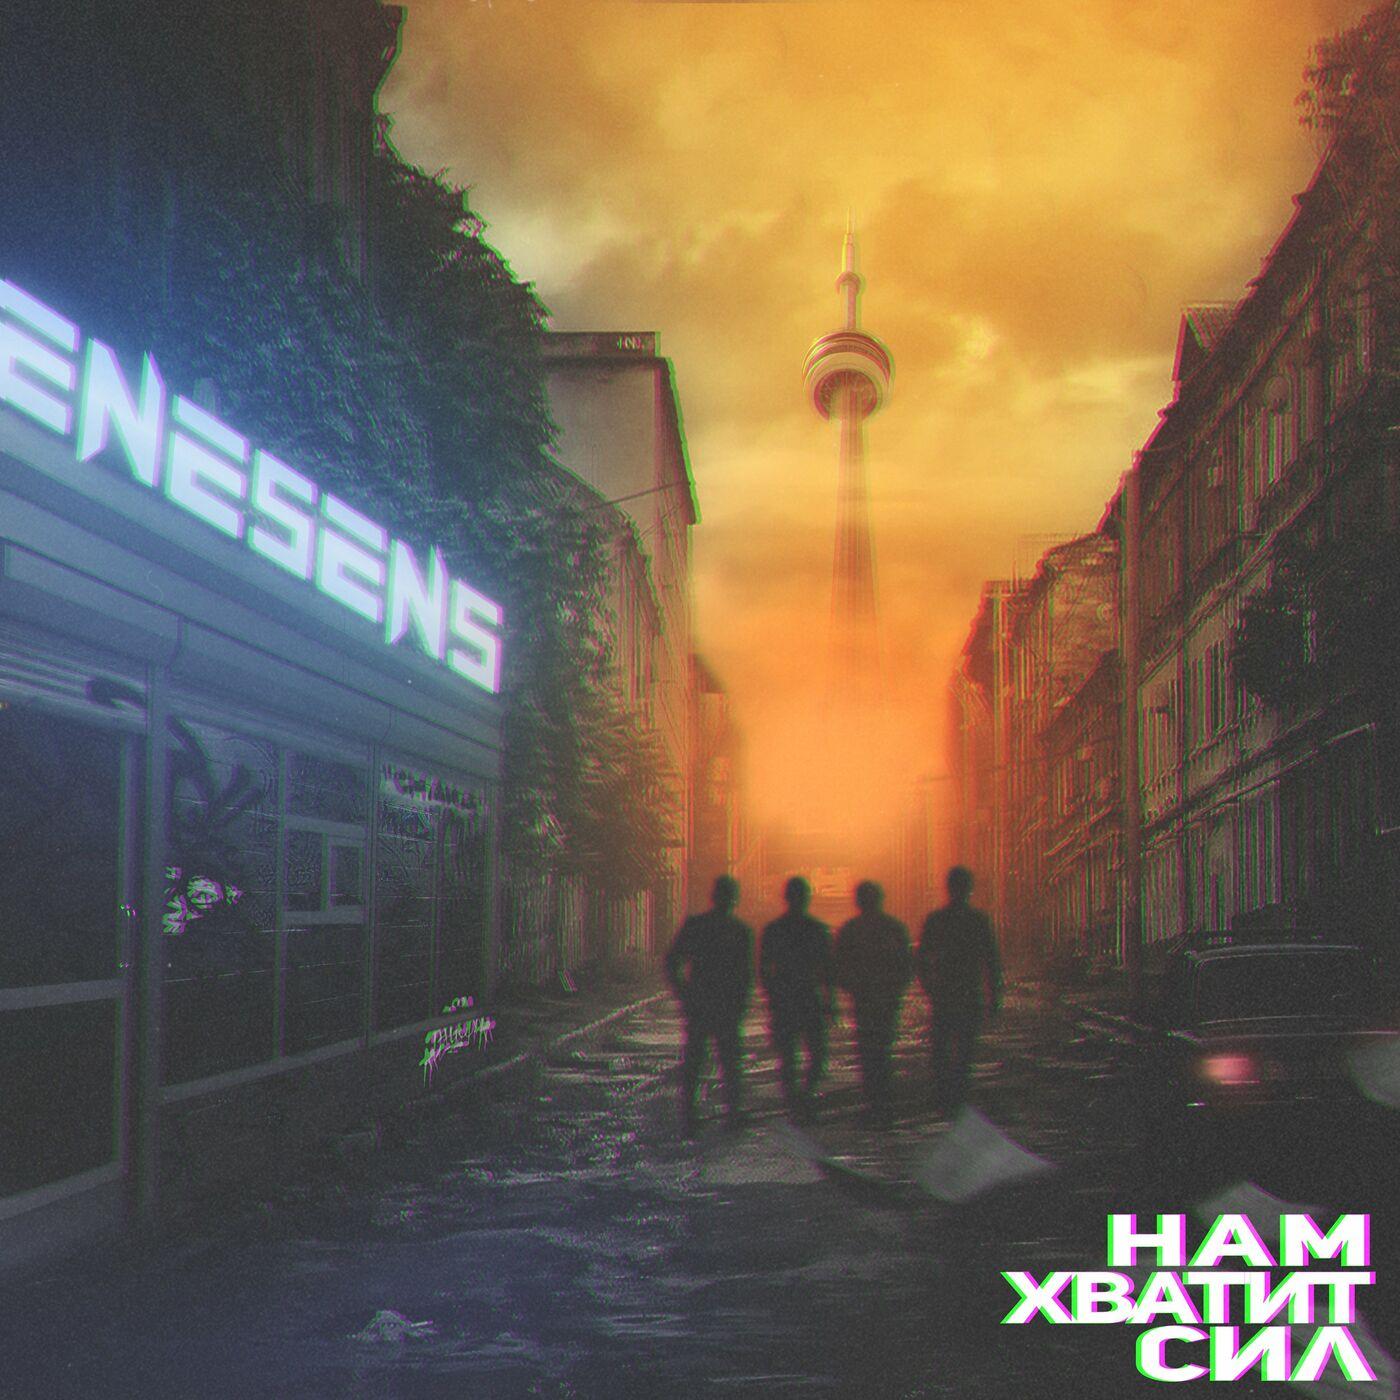 Enesens - Нам хватит сил [single] (2020)